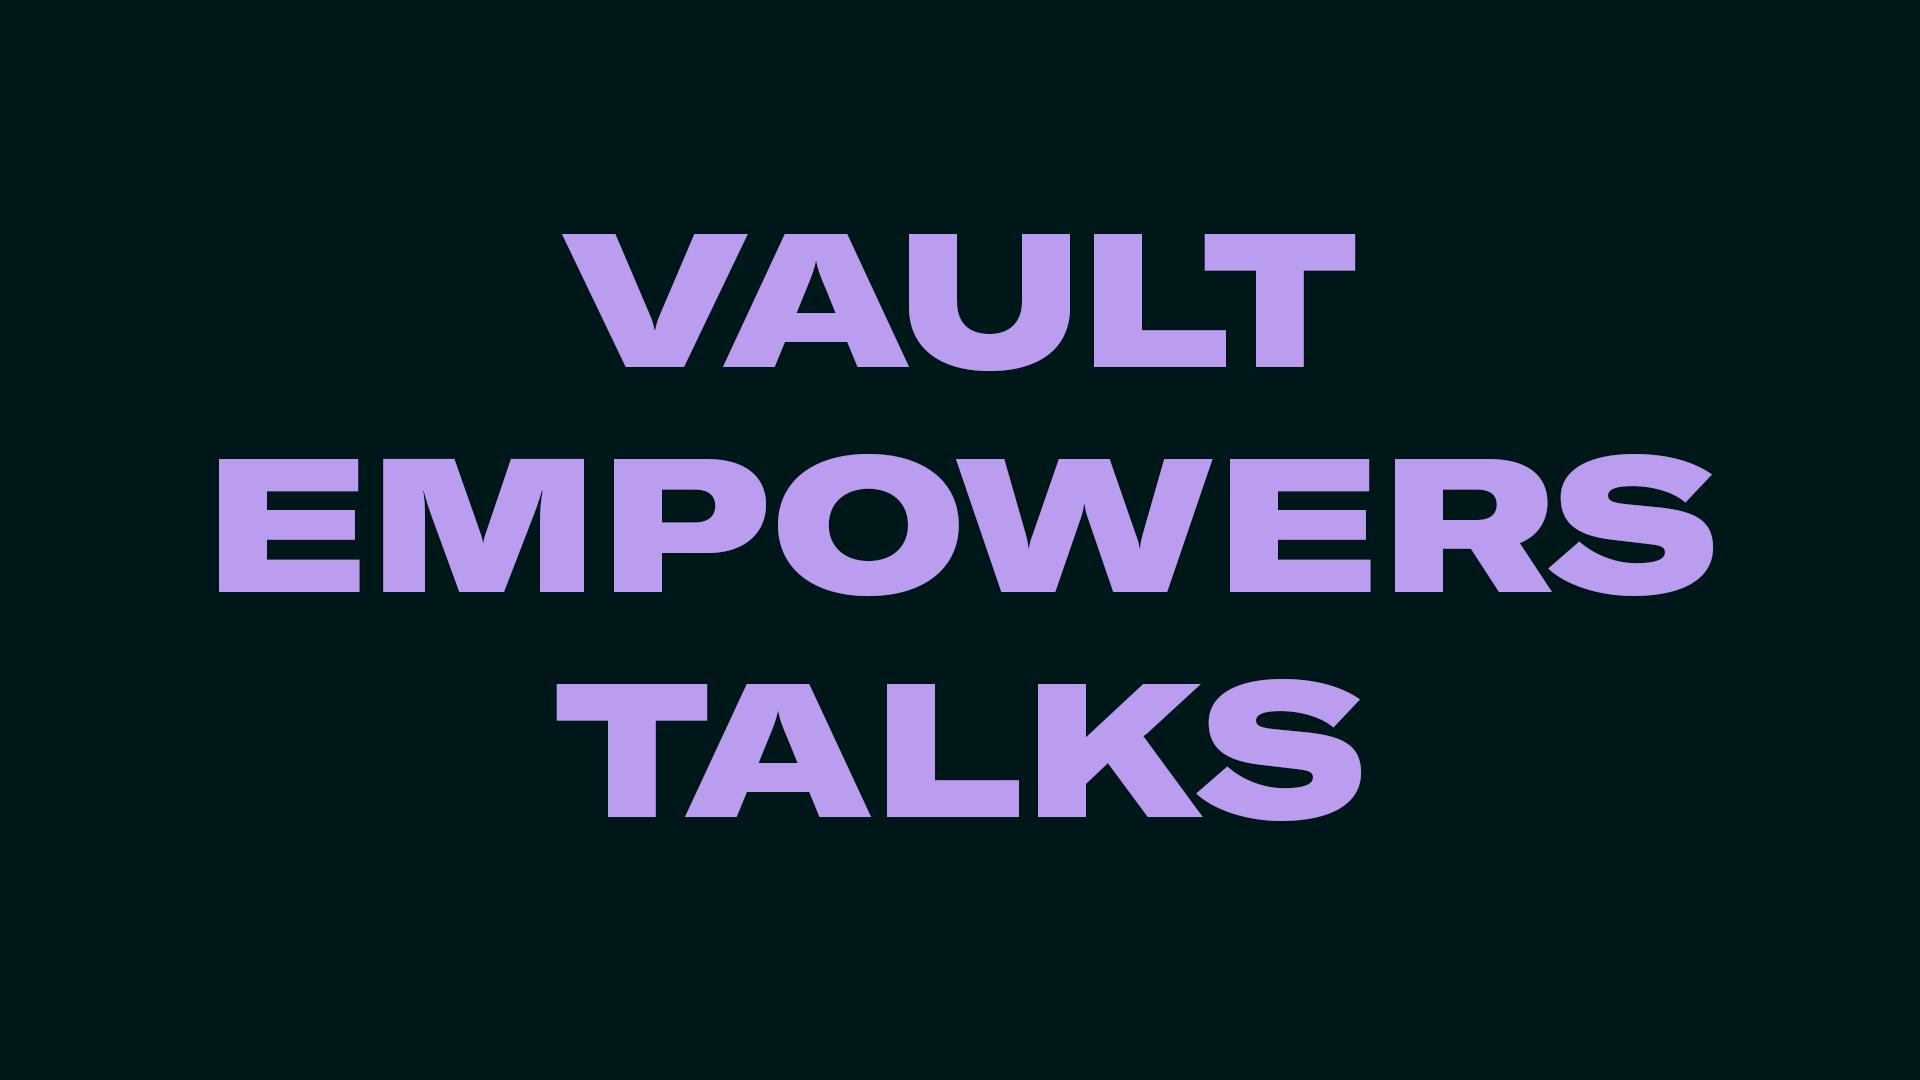 VAULT EMPOWERS TALKS